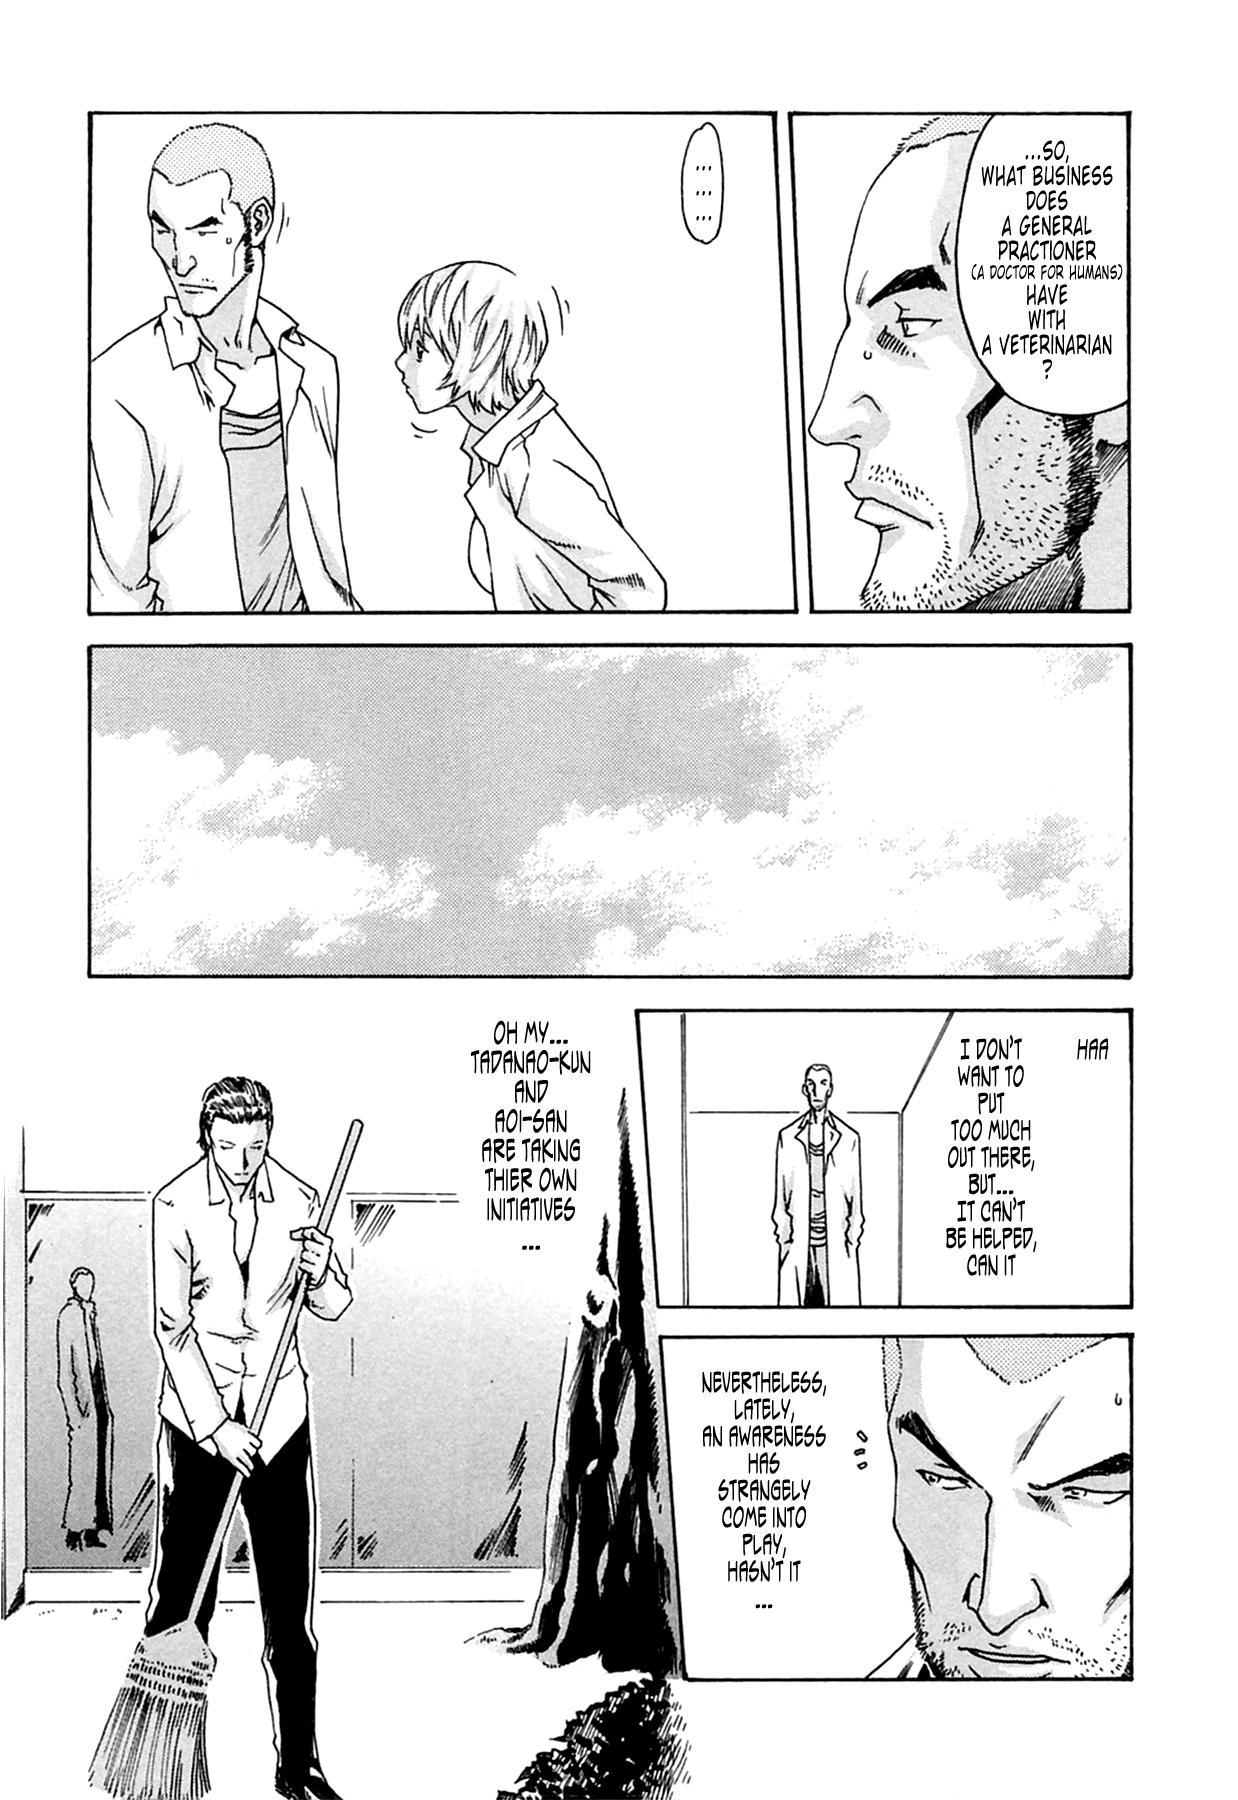 [Haruki] Kisei Juui Suzune (Parasite Doctor Suzune) Vol.02 - CH10-11 14